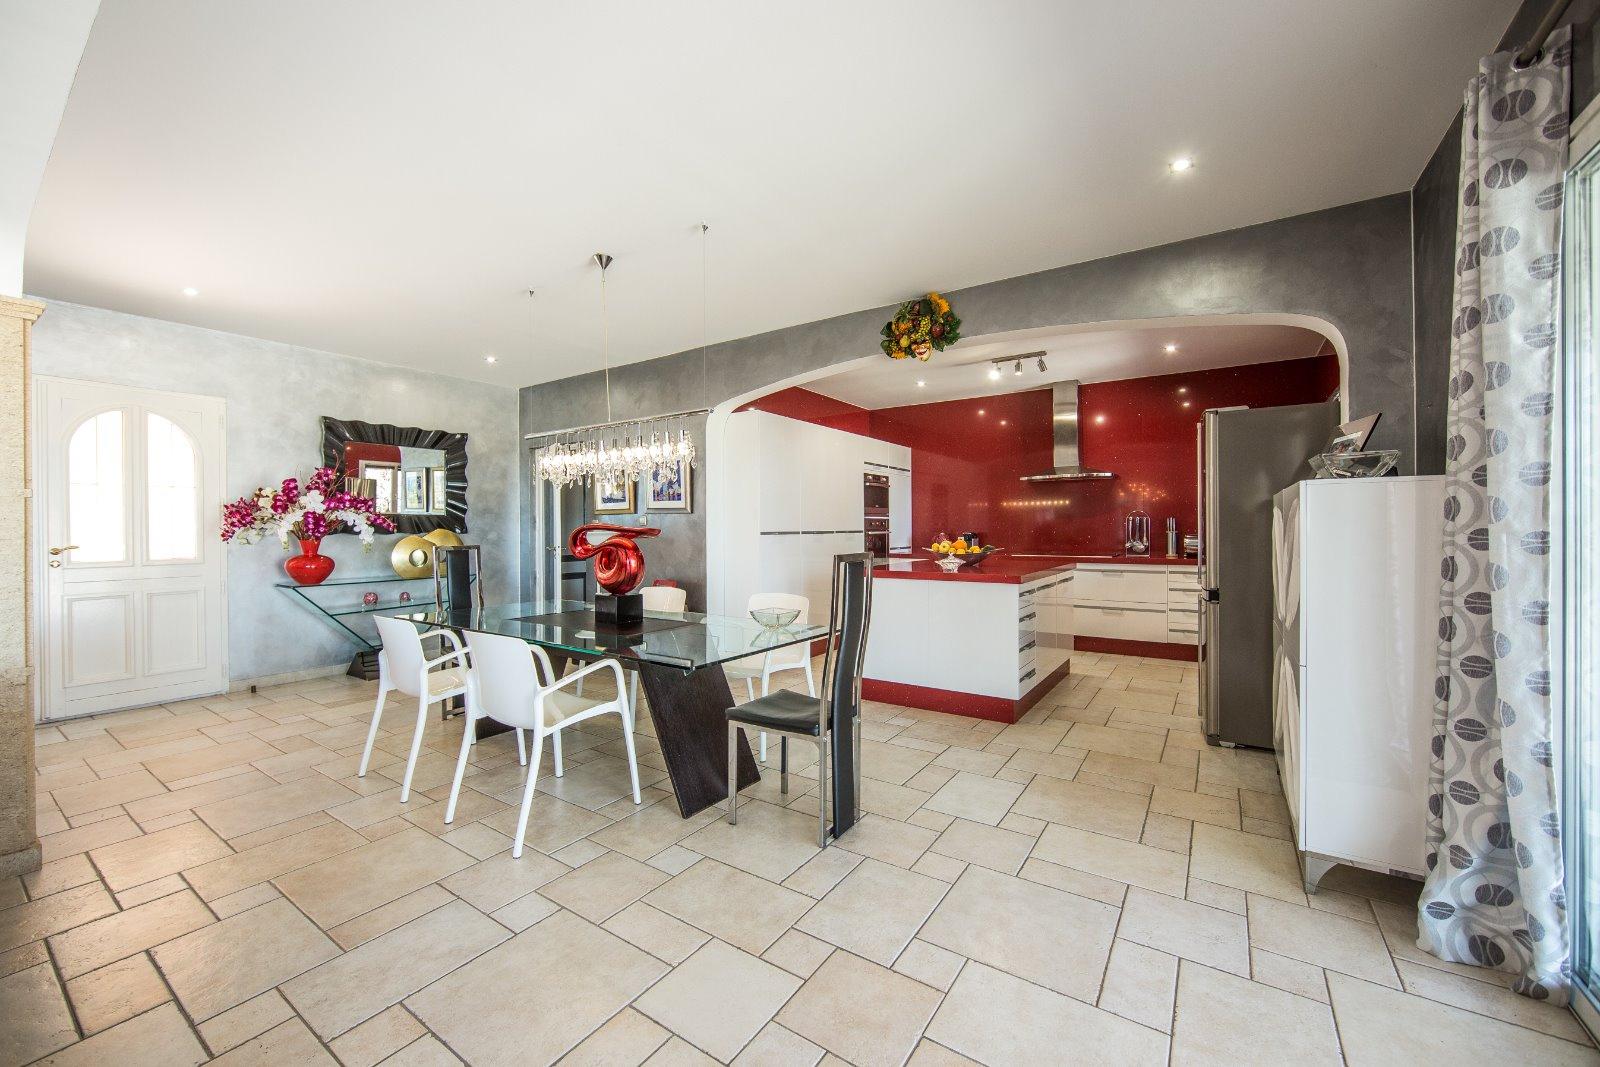 Offres de vente Villa Saint-Mitre-les-Remparts 13920